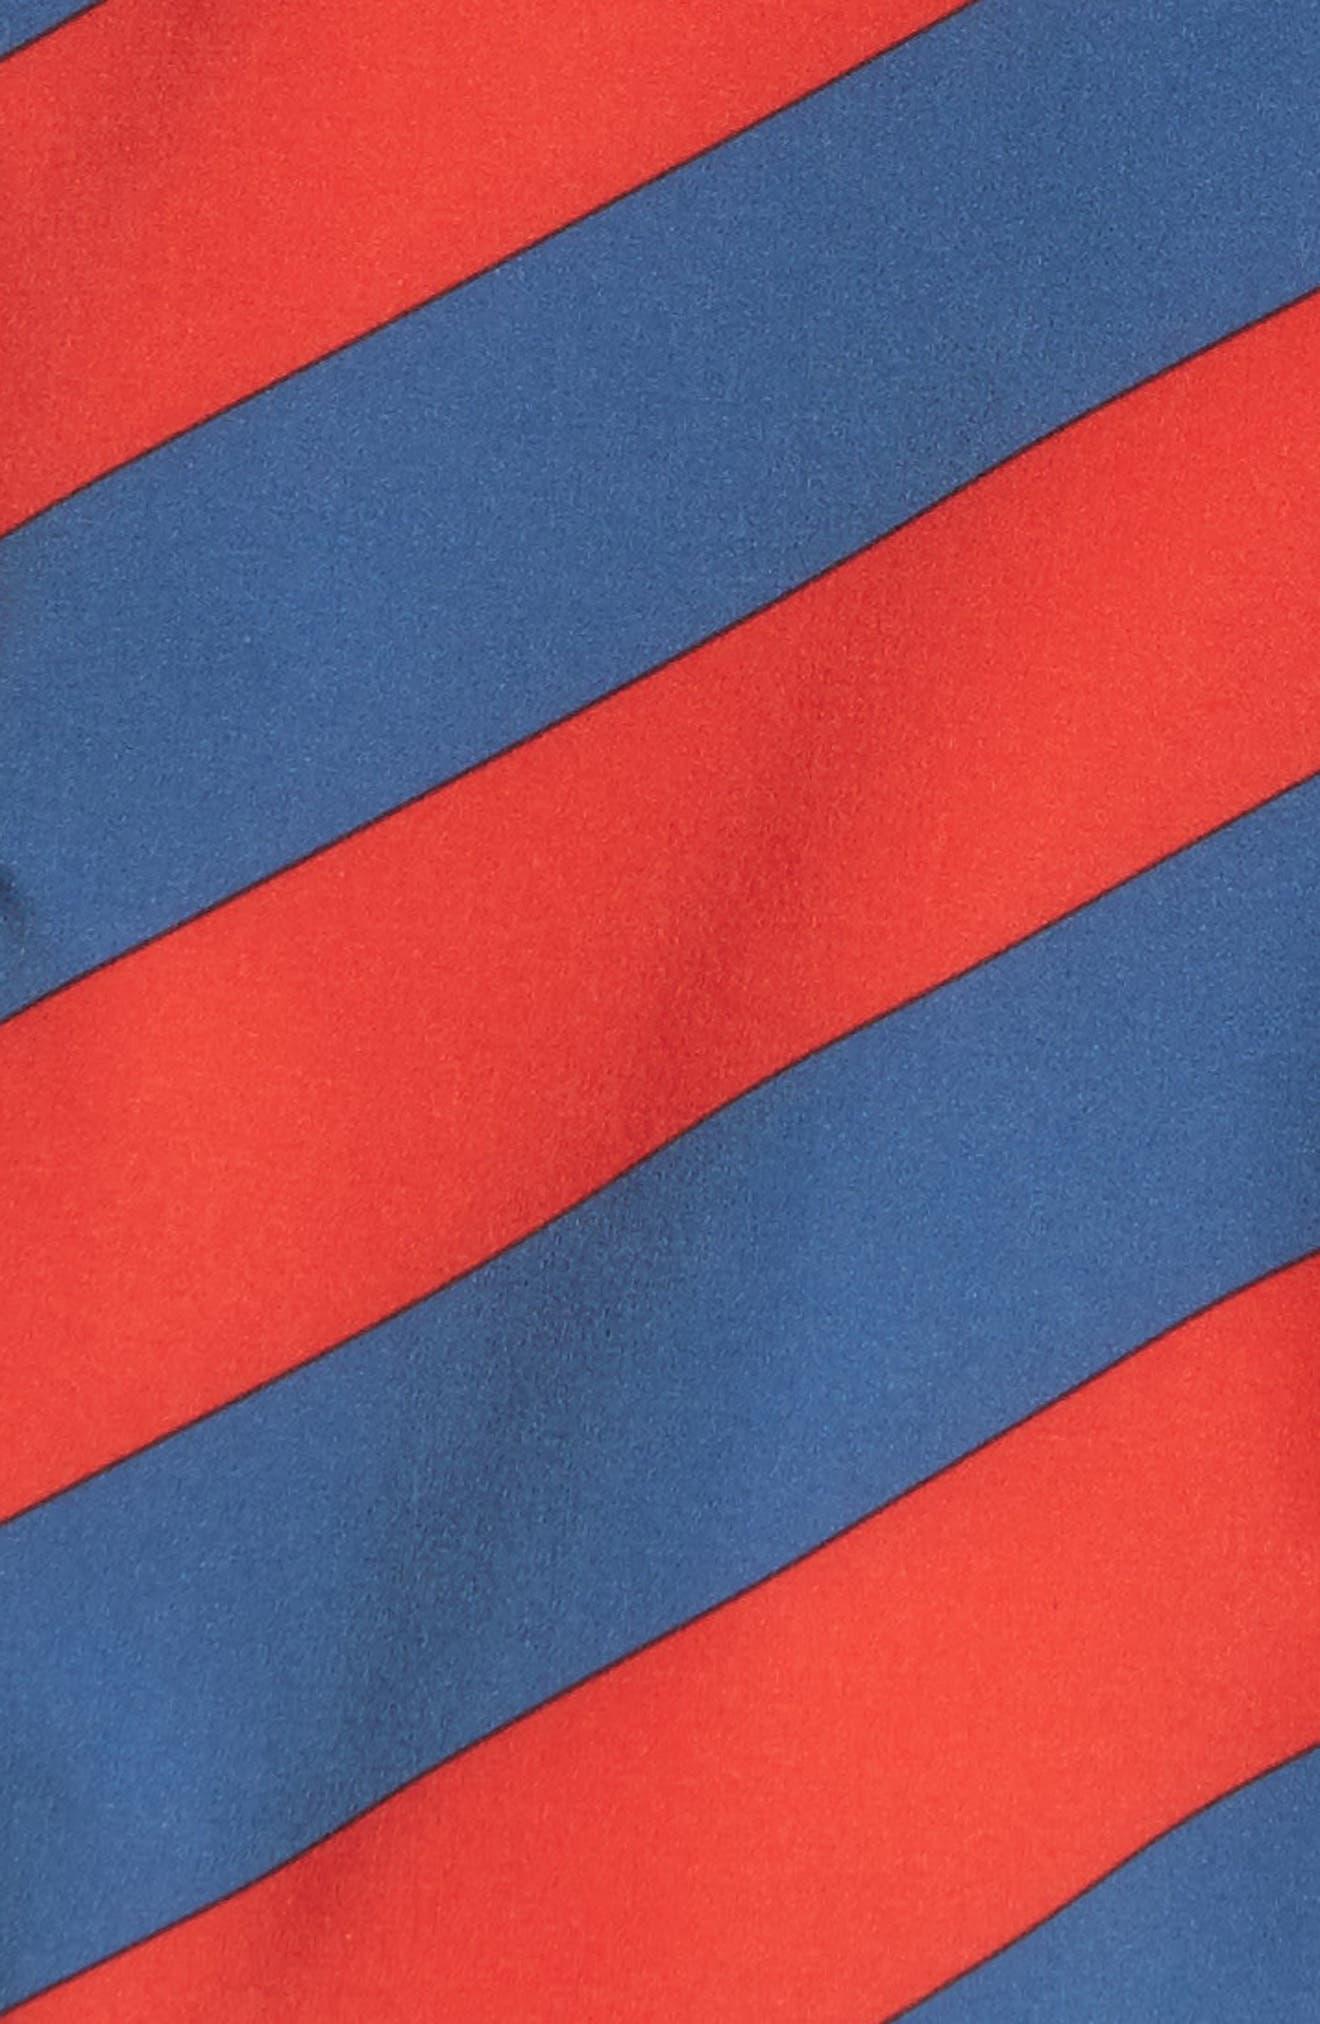 Stripey Jammer Board Shorts,                             Alternate thumbnail 15, color,